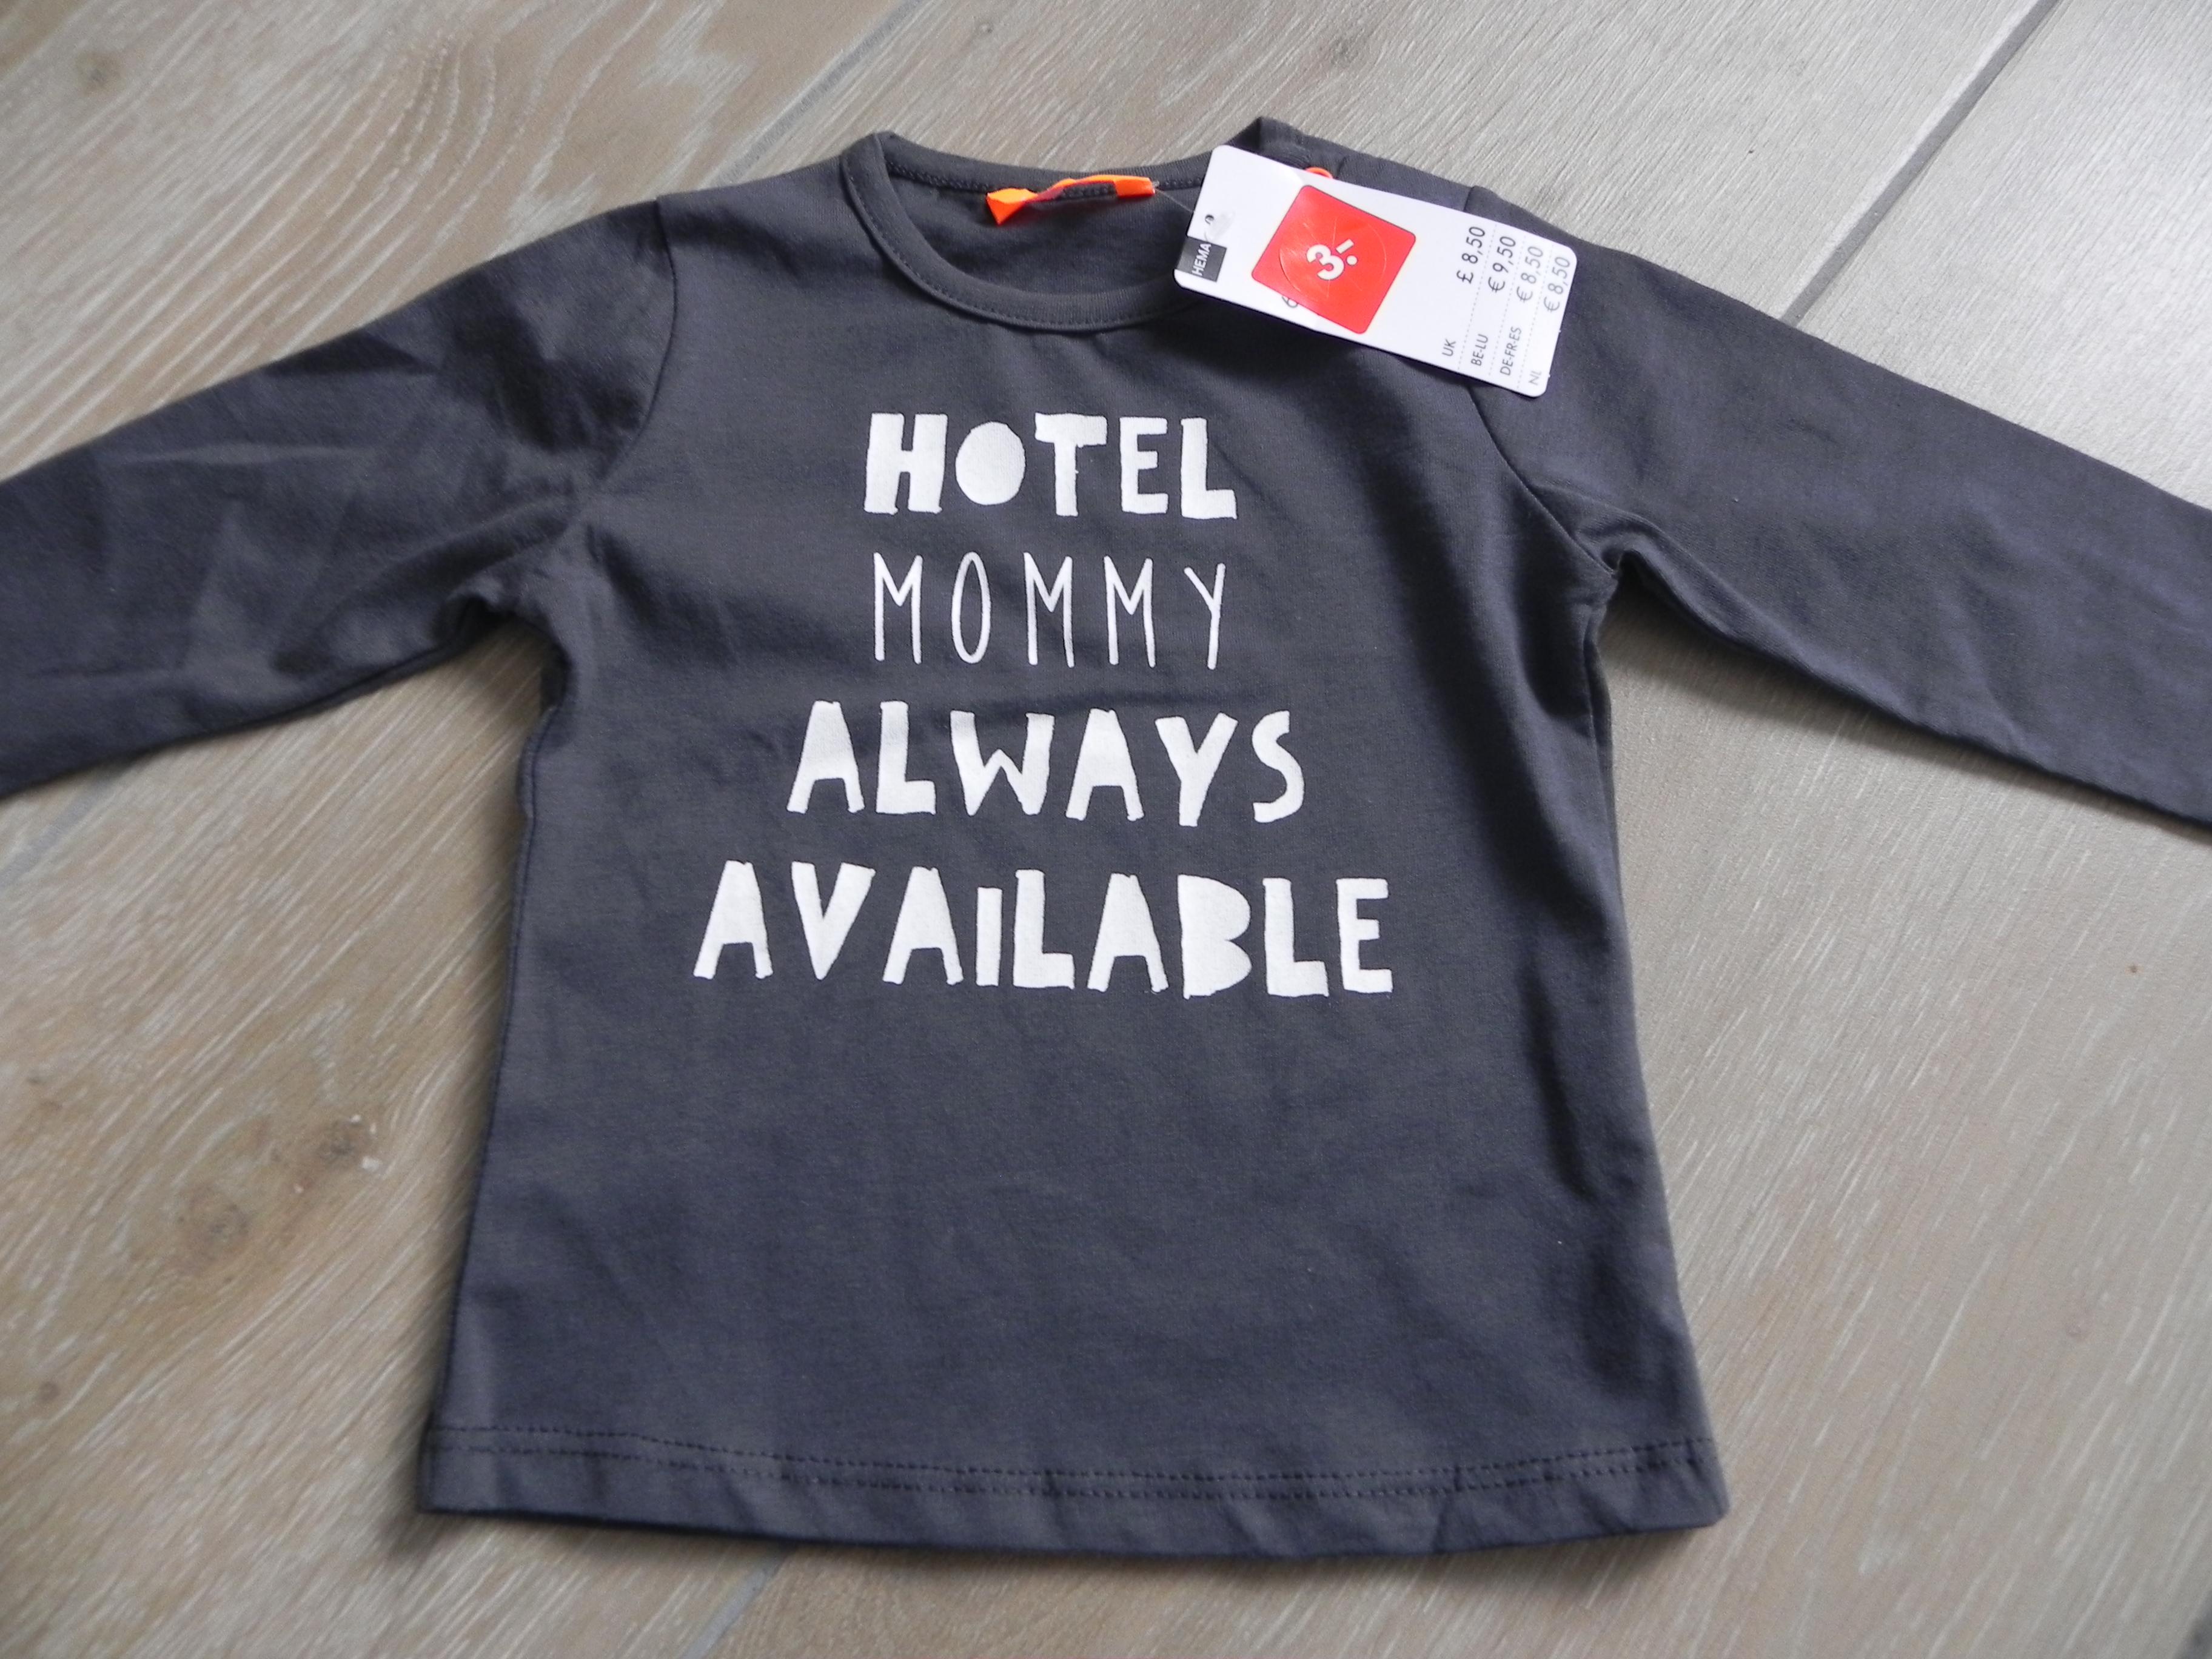 shoplog hema, blog, shoppen, kinderen, baby, mama, mamablog, hema, lifestyleblog, La Log